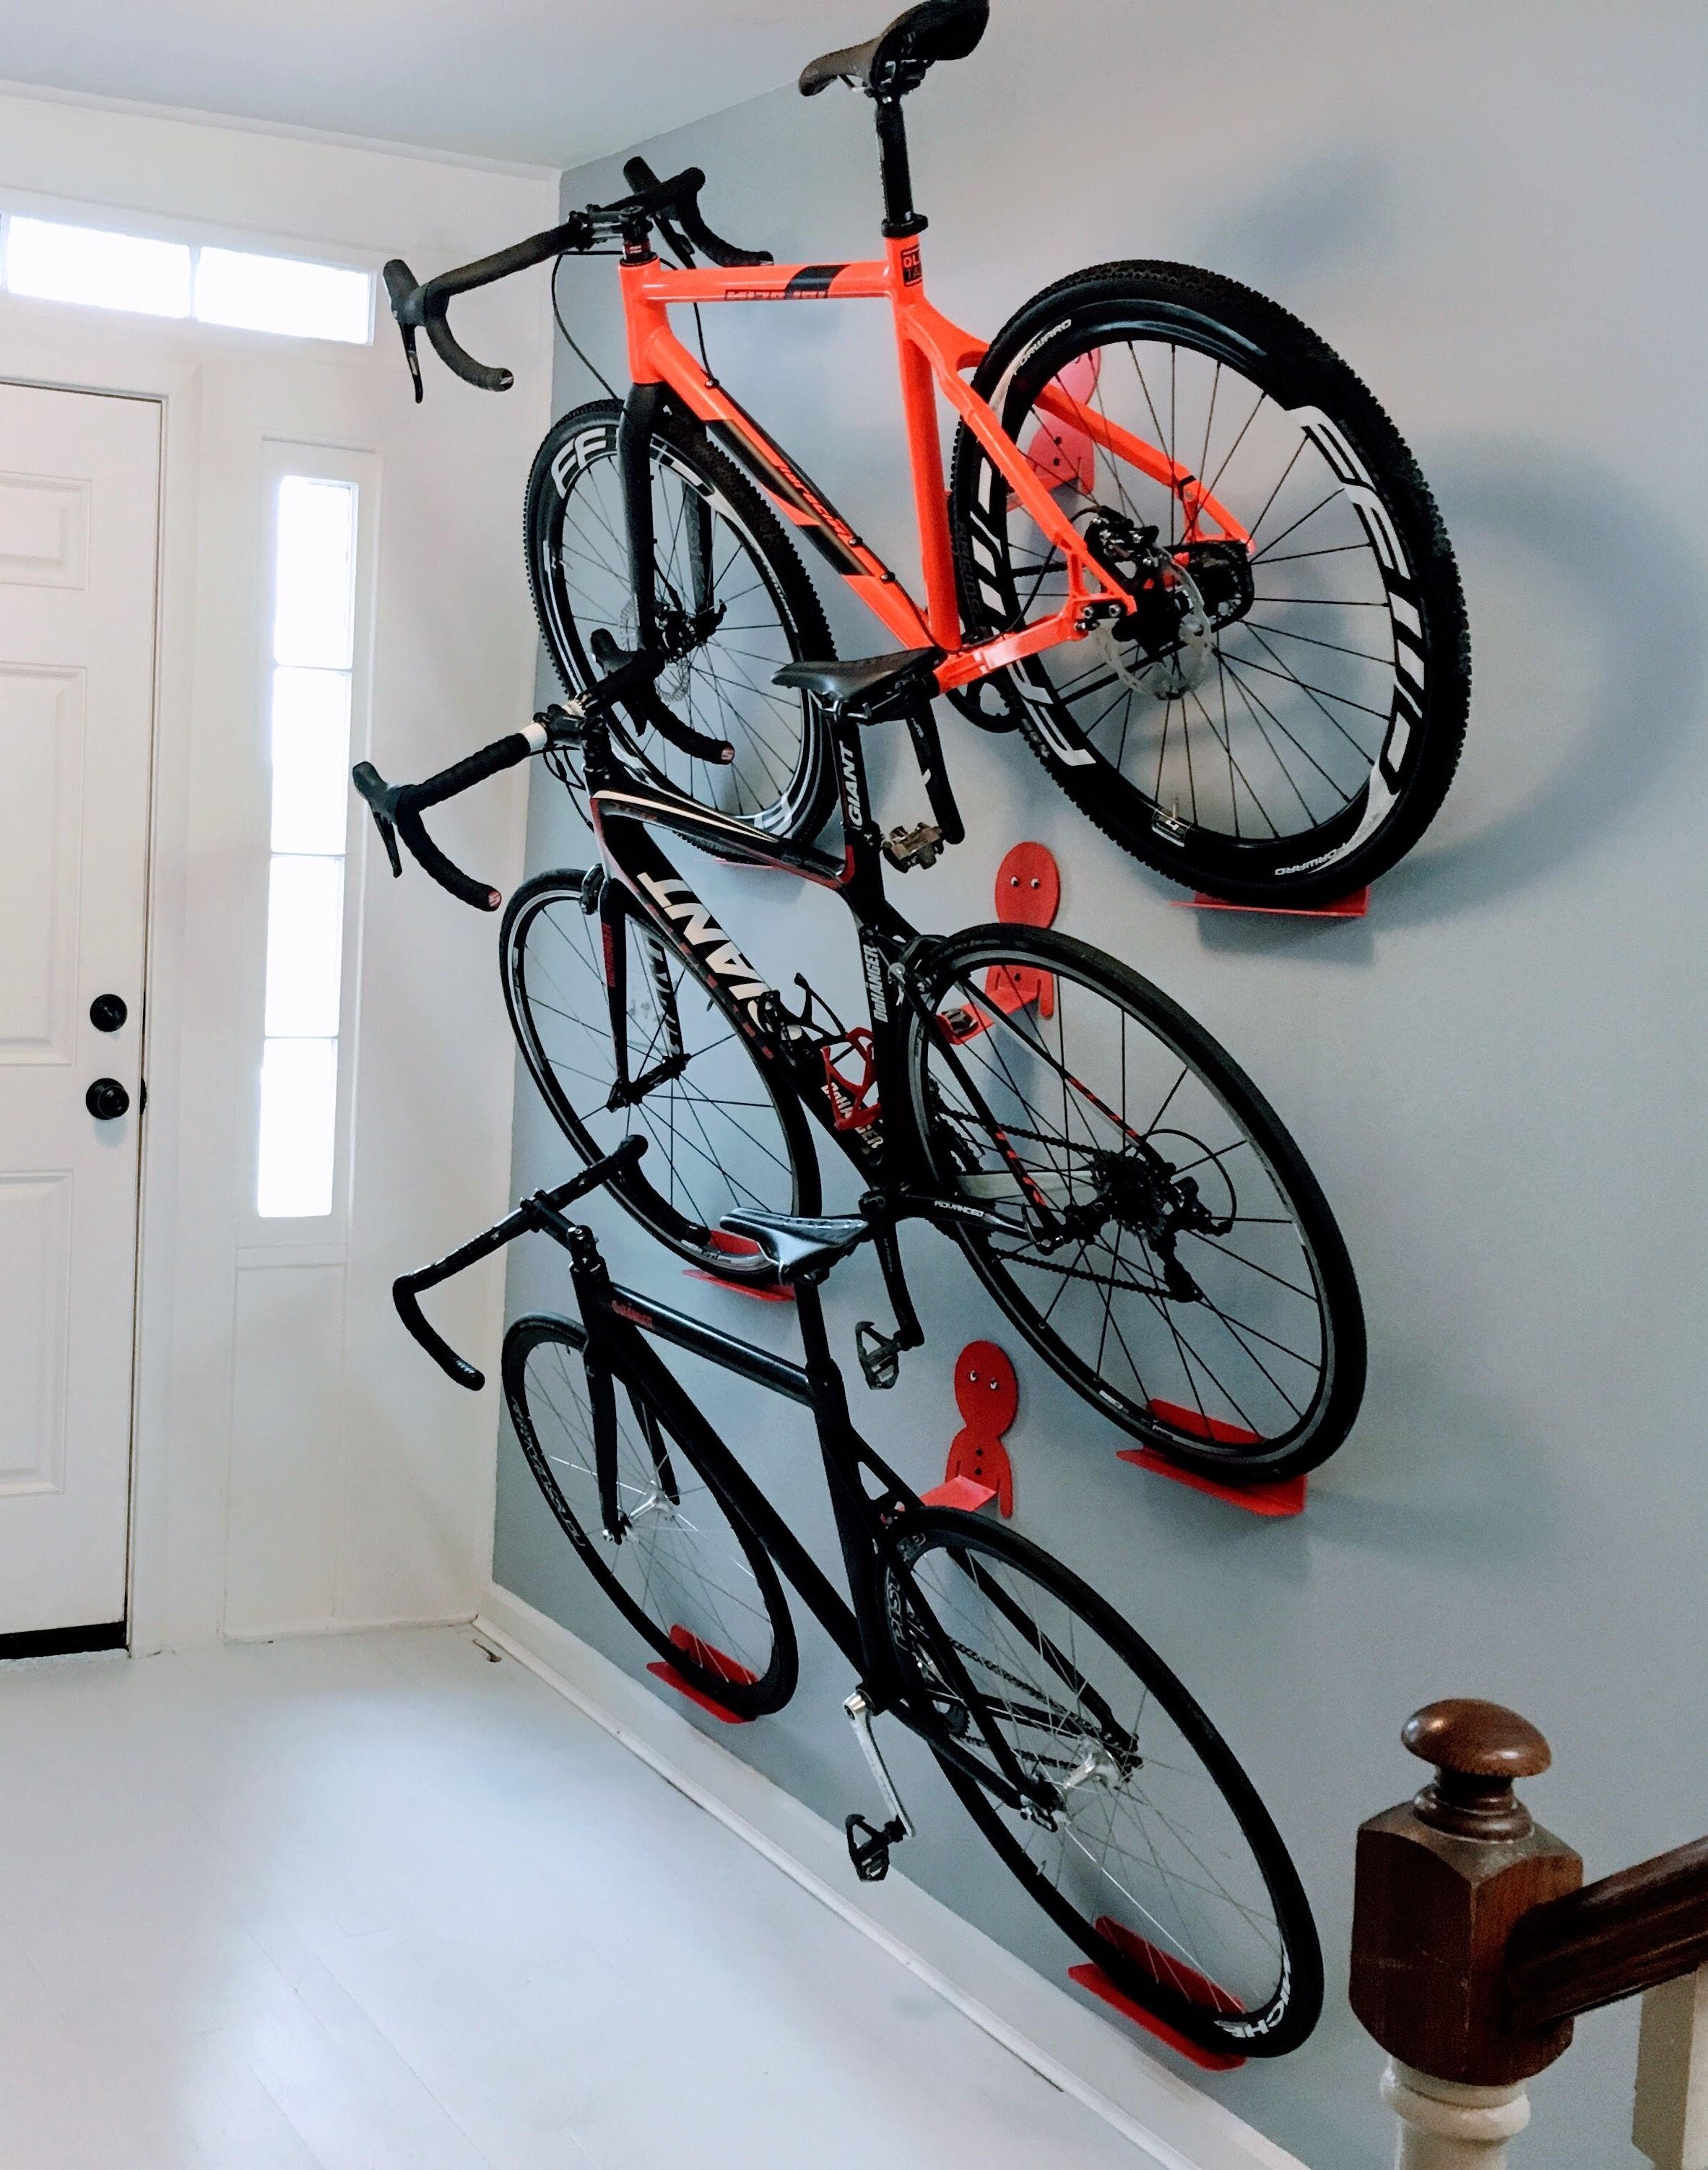 Multiple Bikes Hanging Rack System Dahanger Dan Pedal Hook Bike Rack Wall Bike Wall Mount Wall Mount Bike Rack